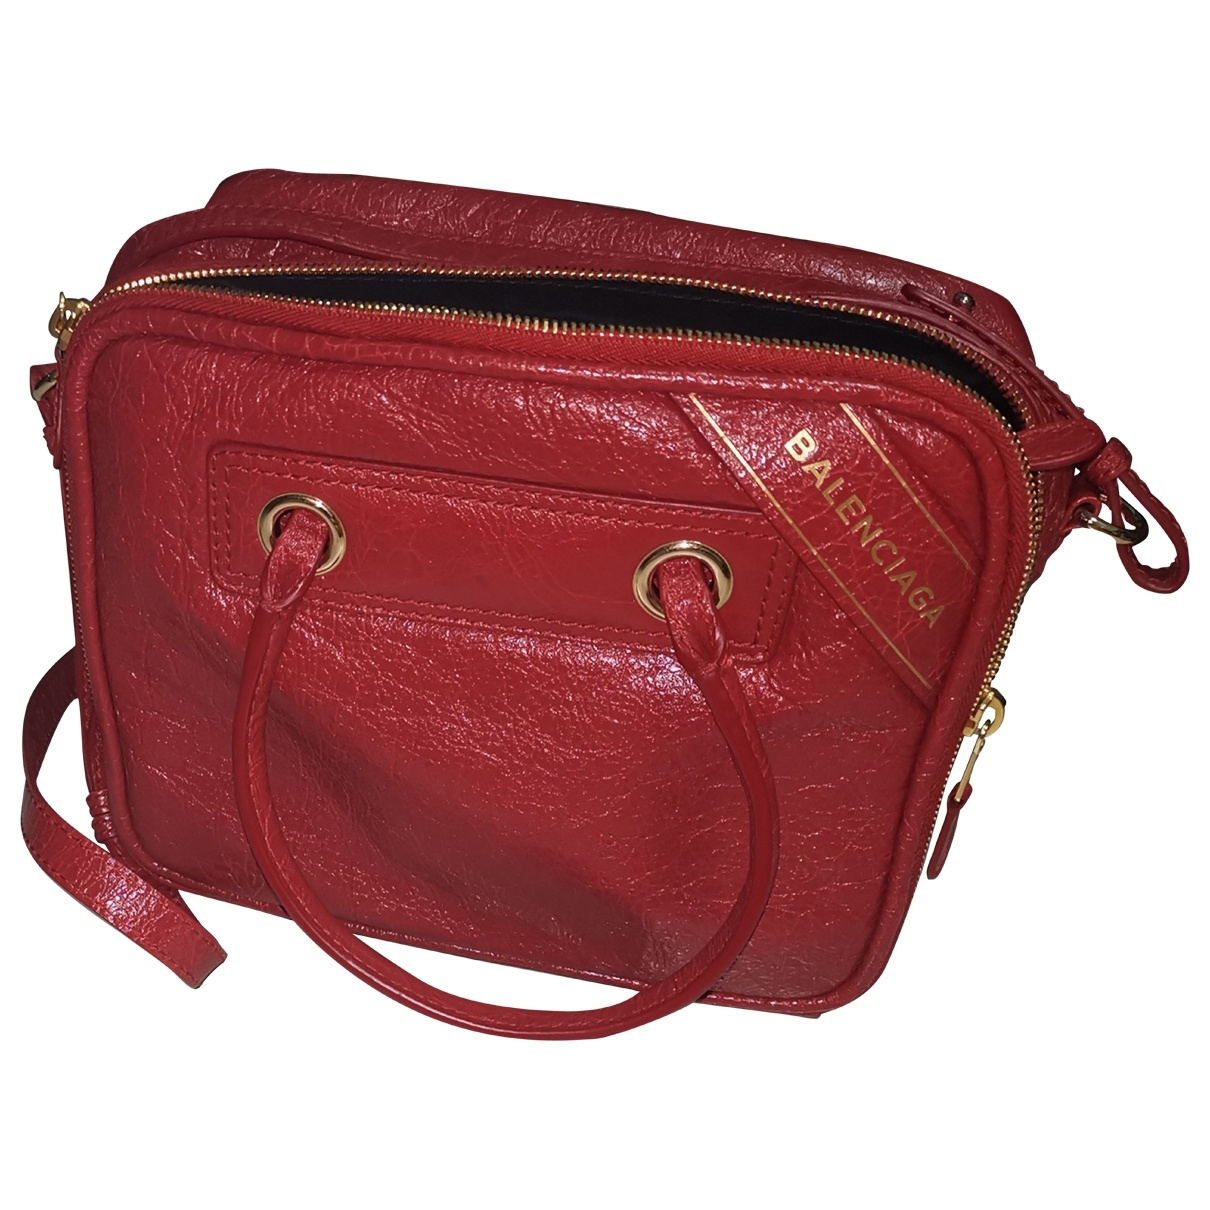 Balenciaga Blanket Handtasche in  Rot Leder